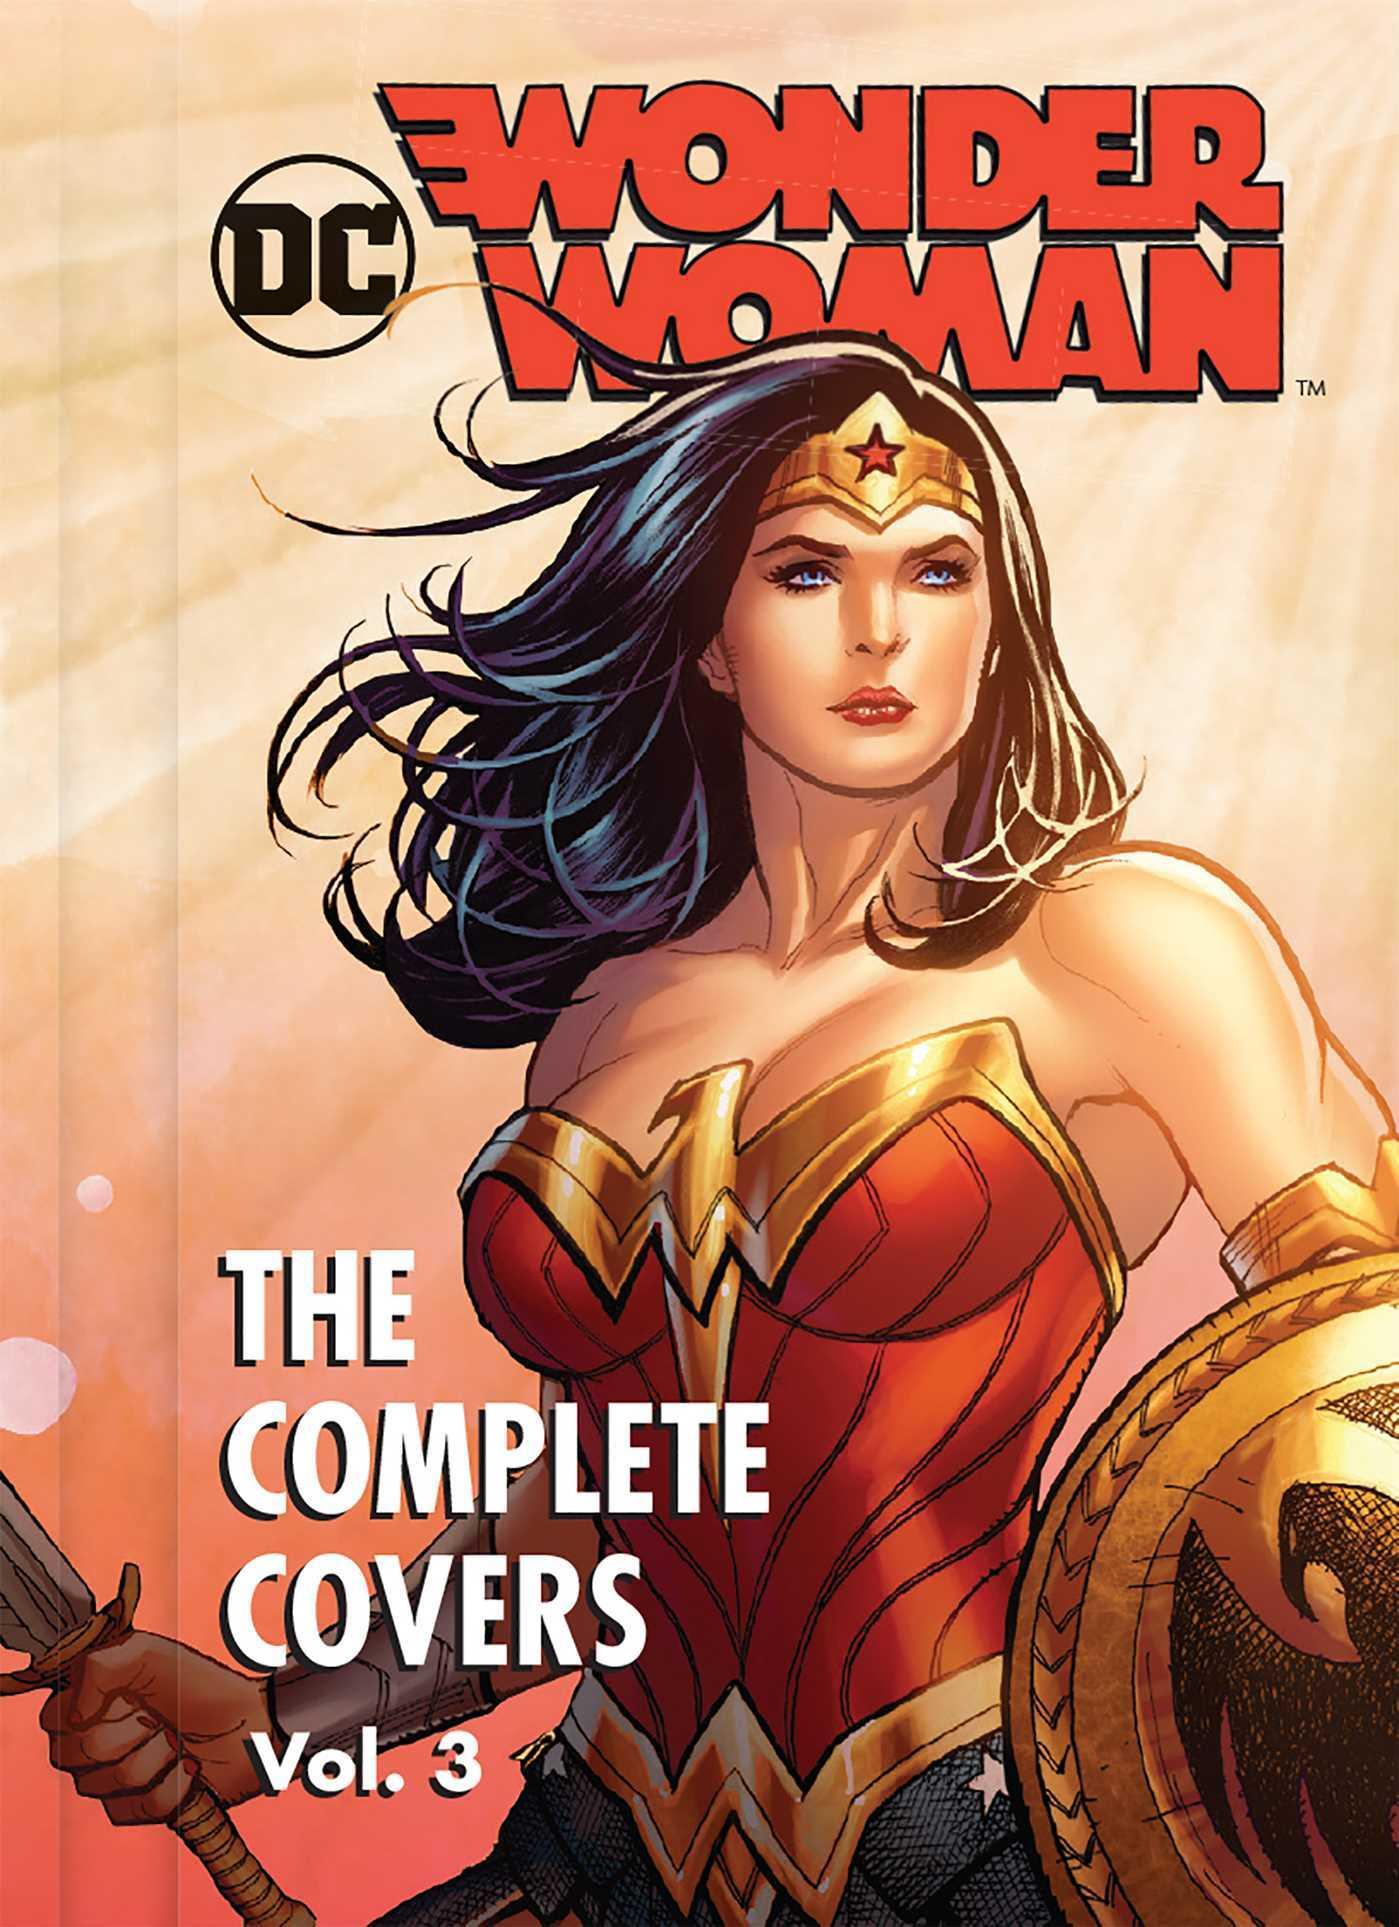 DC Comics: Wonder Woman: The Complete Covers Vol. 3